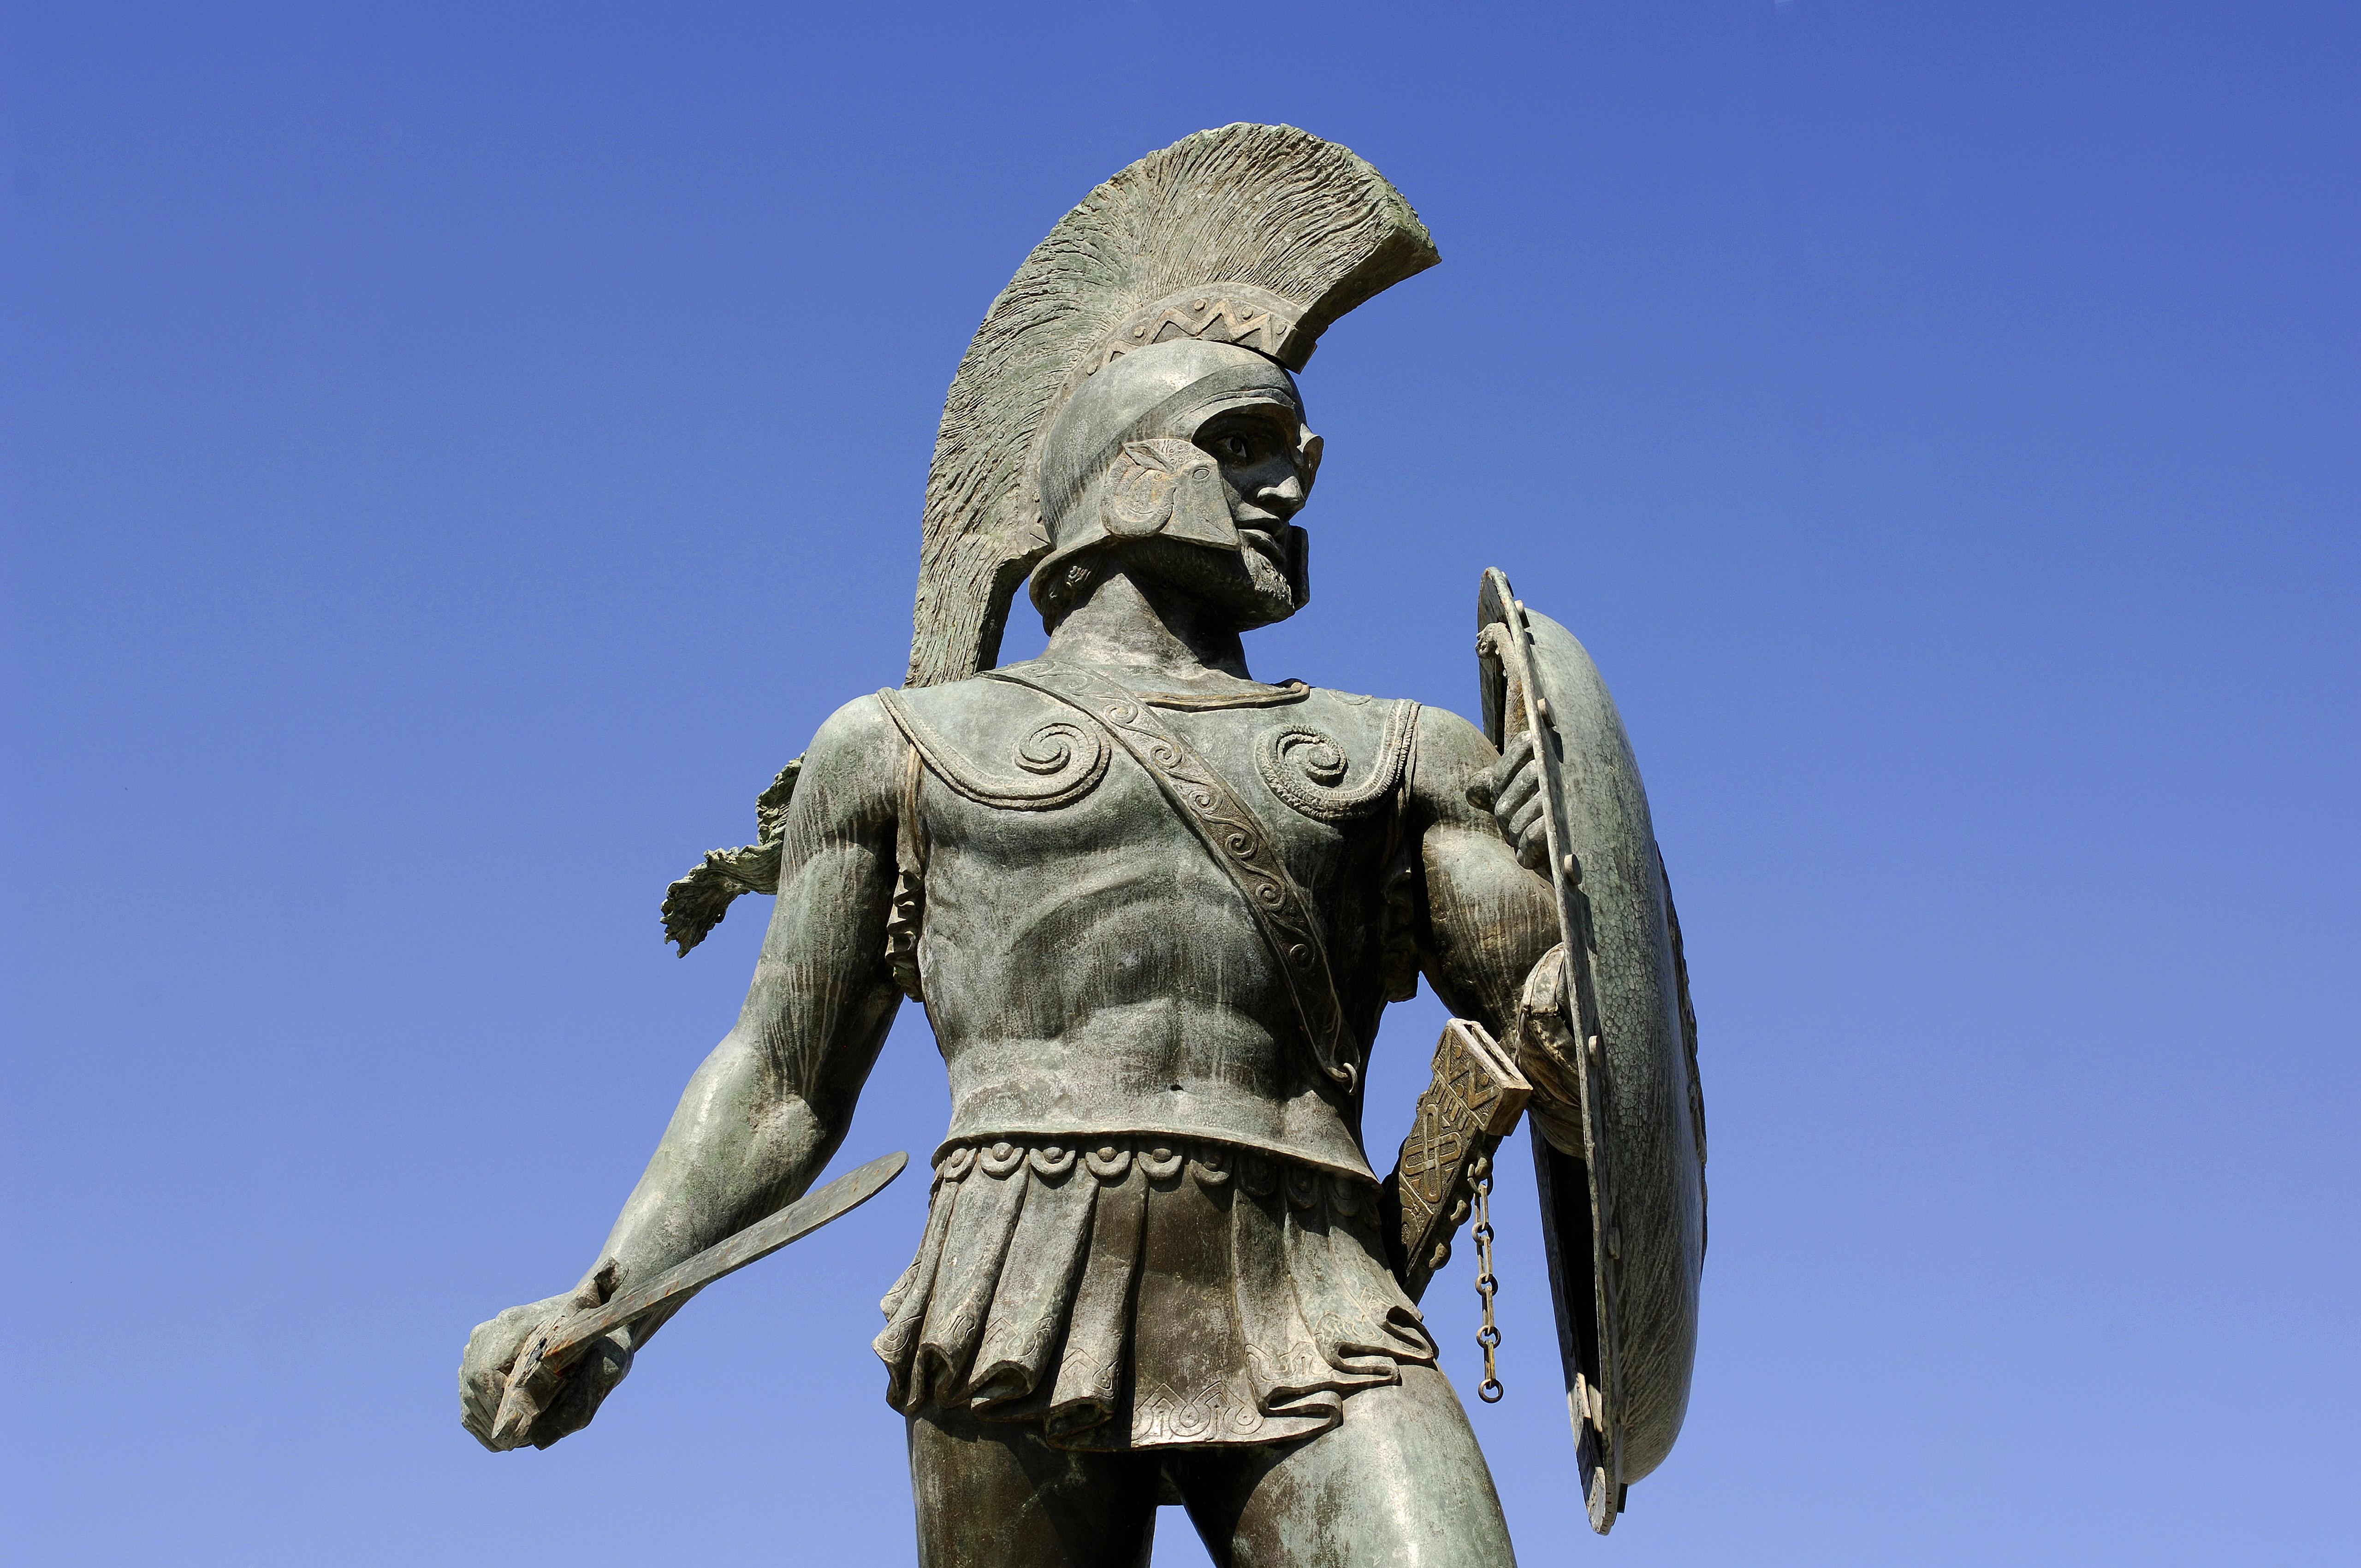 greece-peloponnese-sparta-leonidas-statue-2 - Sparta ...